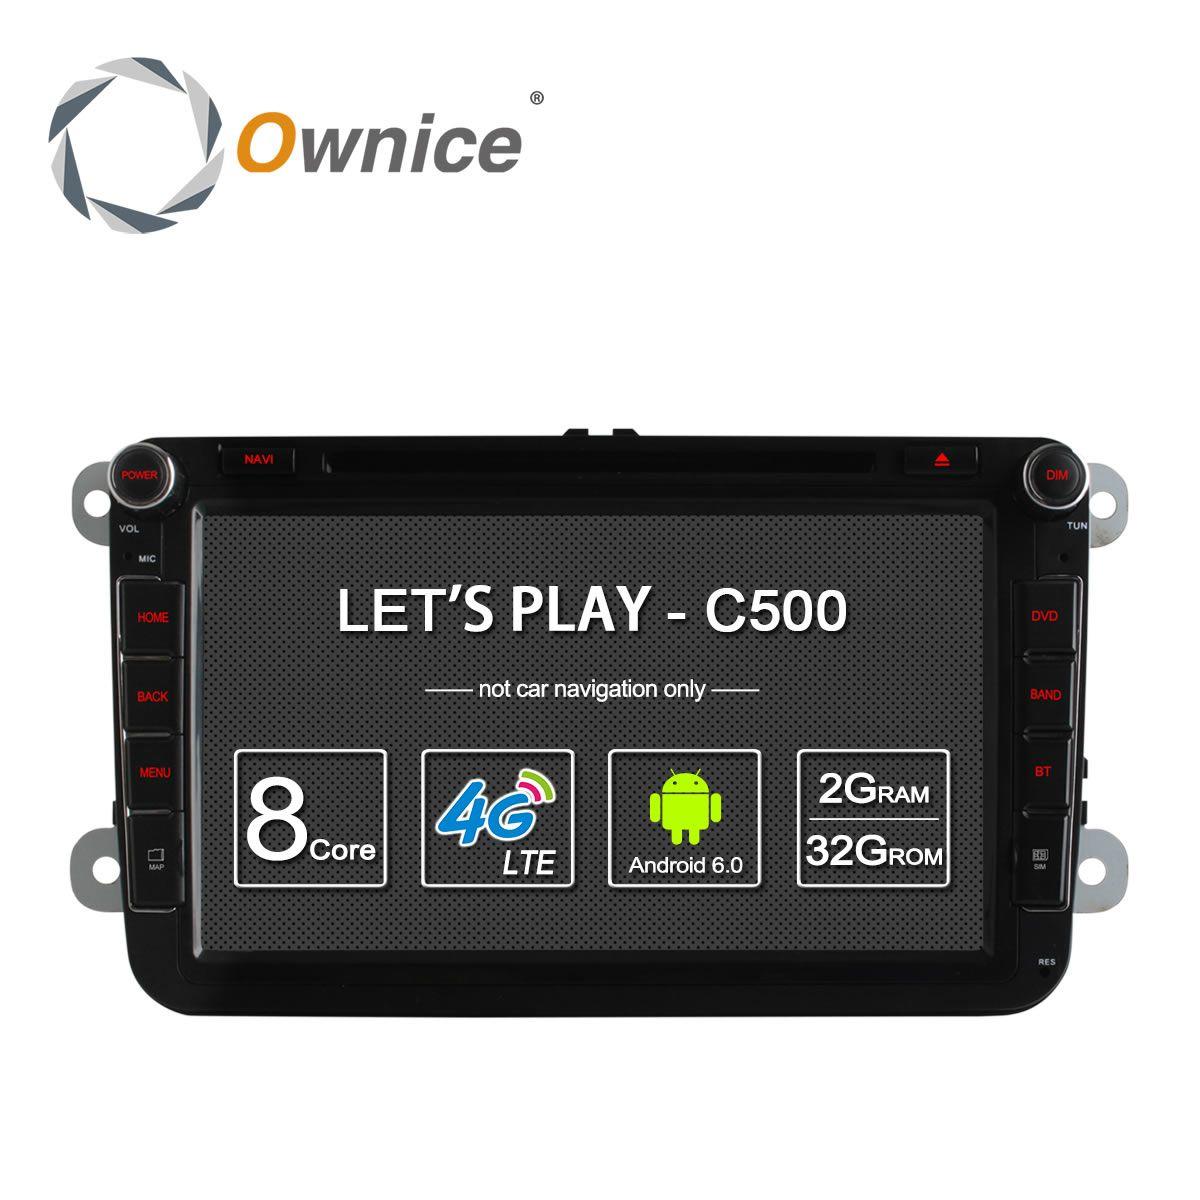 4G SIM LTE Netzwerk Ownice C500 Octa 8 Core Android 6.0 2G RAM 2 Din Auto DVD GPS Navi Radio-Player Für VW Skoda Octavia 2